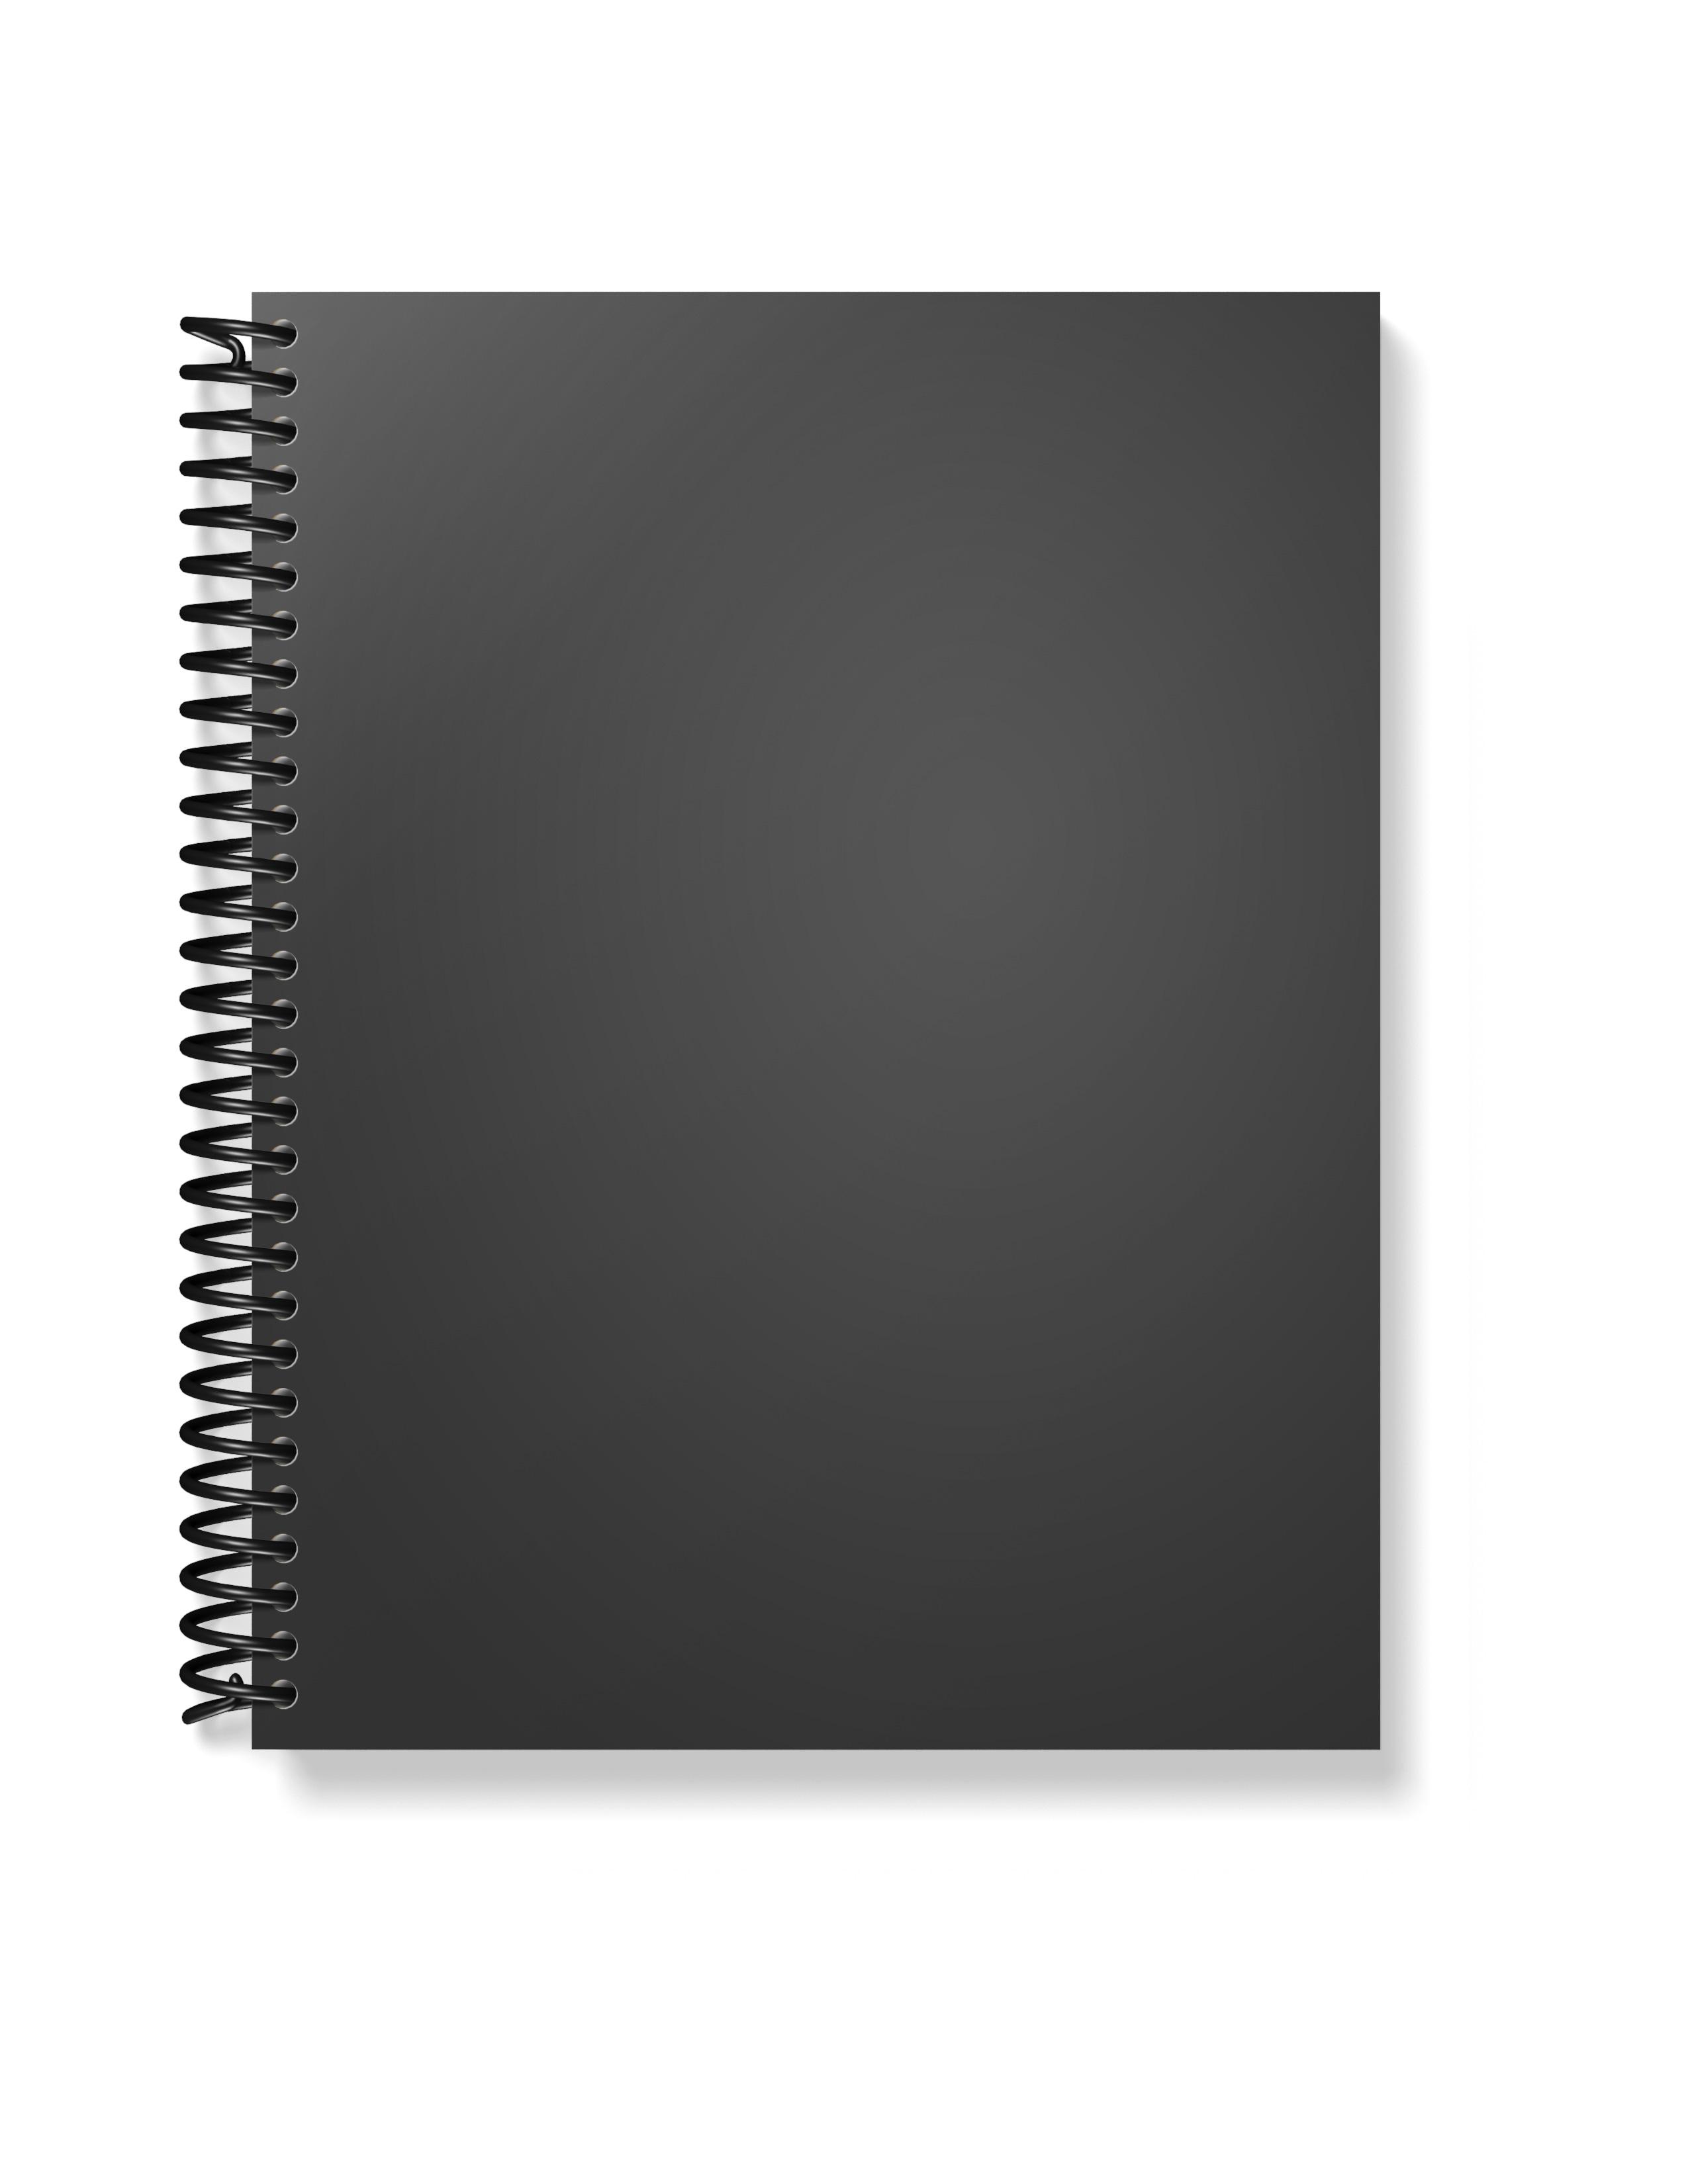 Notebook front Mockup